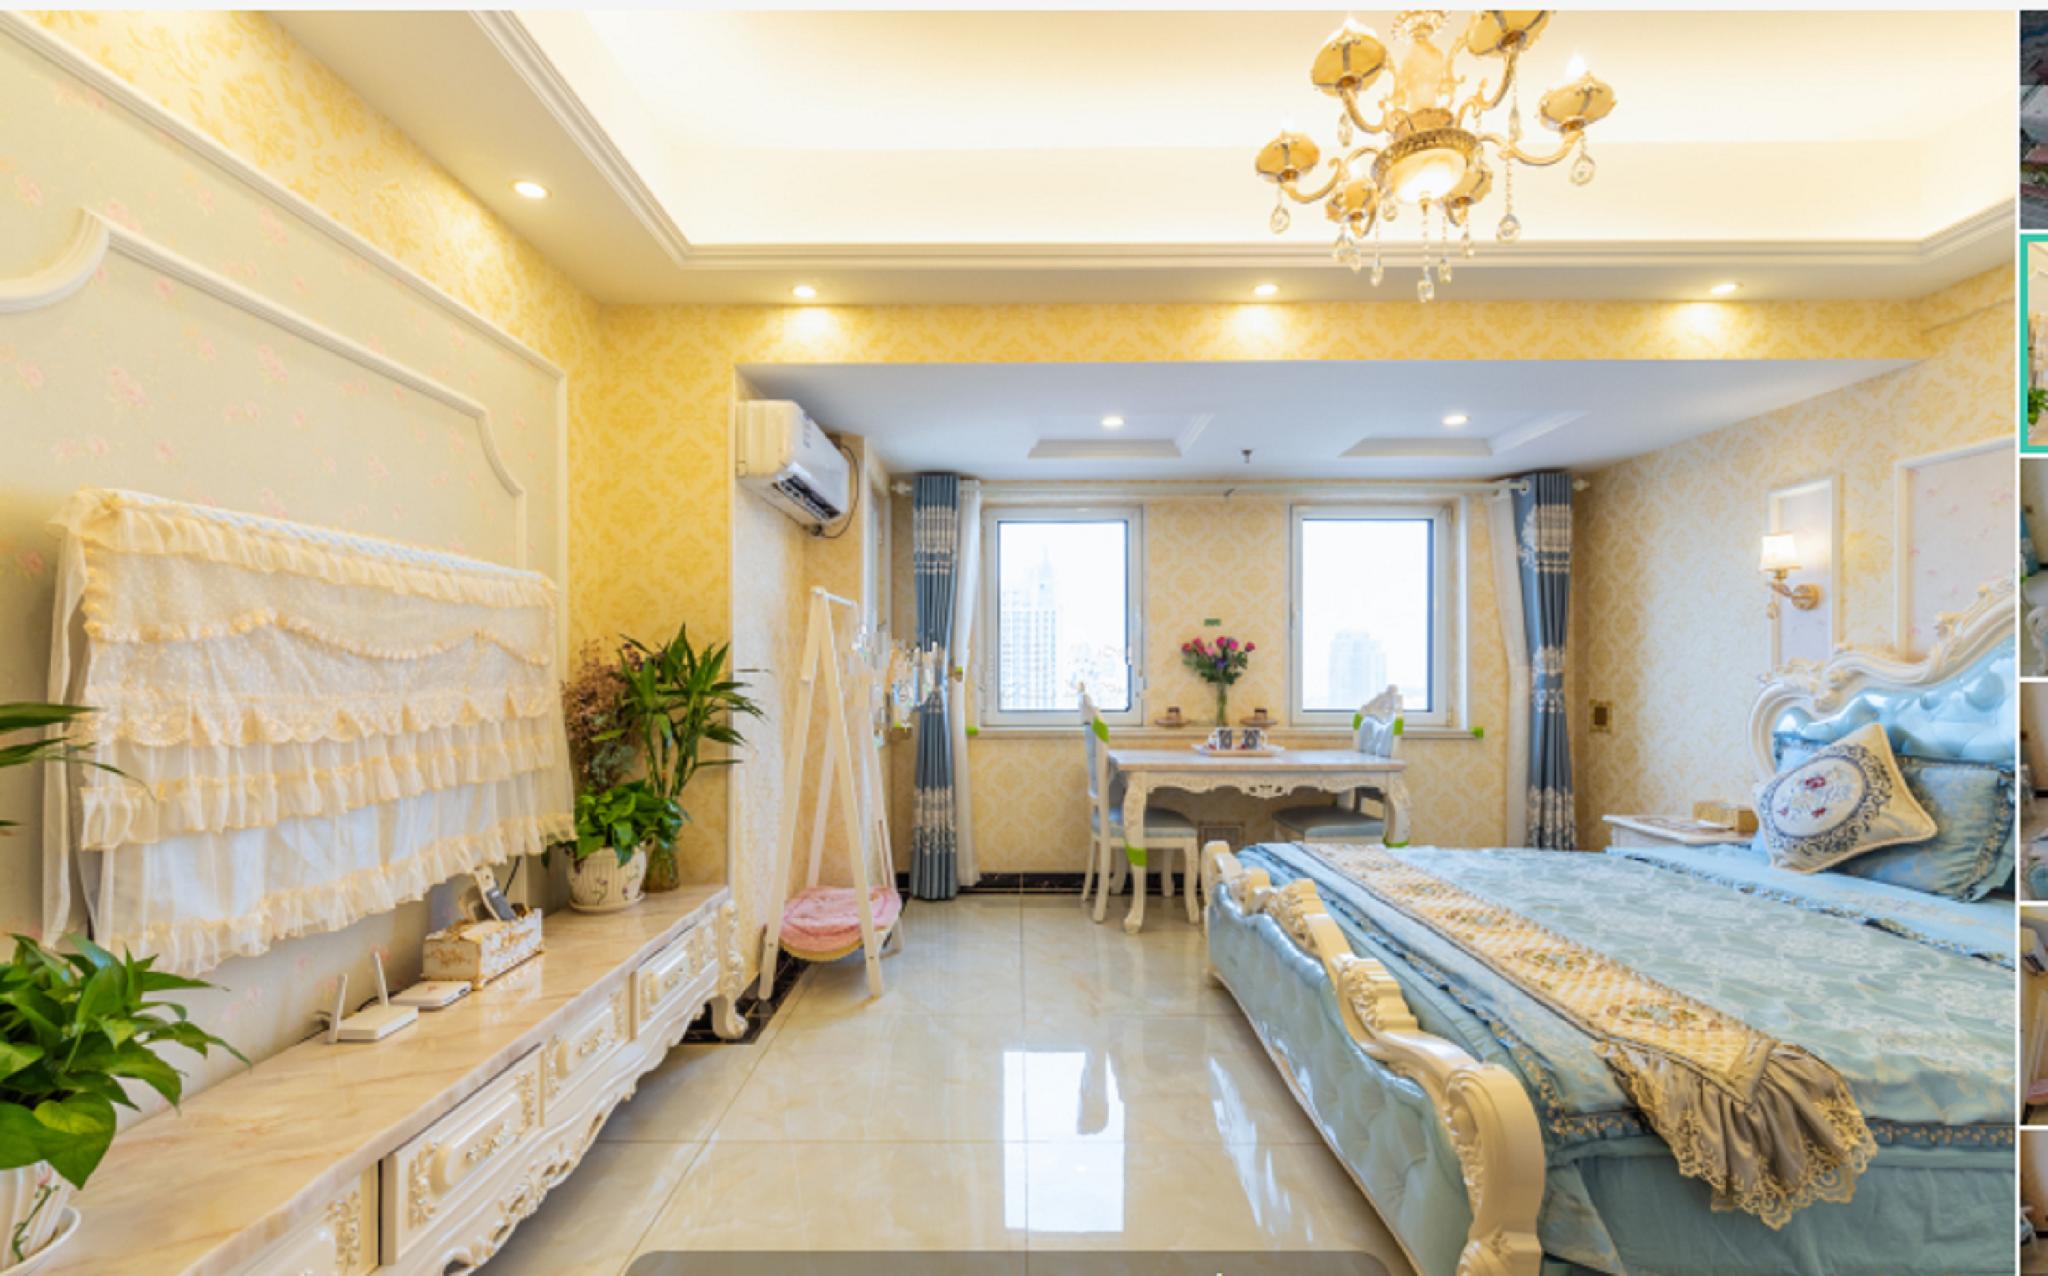 Yantai Wanda Haiwei Seaview Hotel Apartment